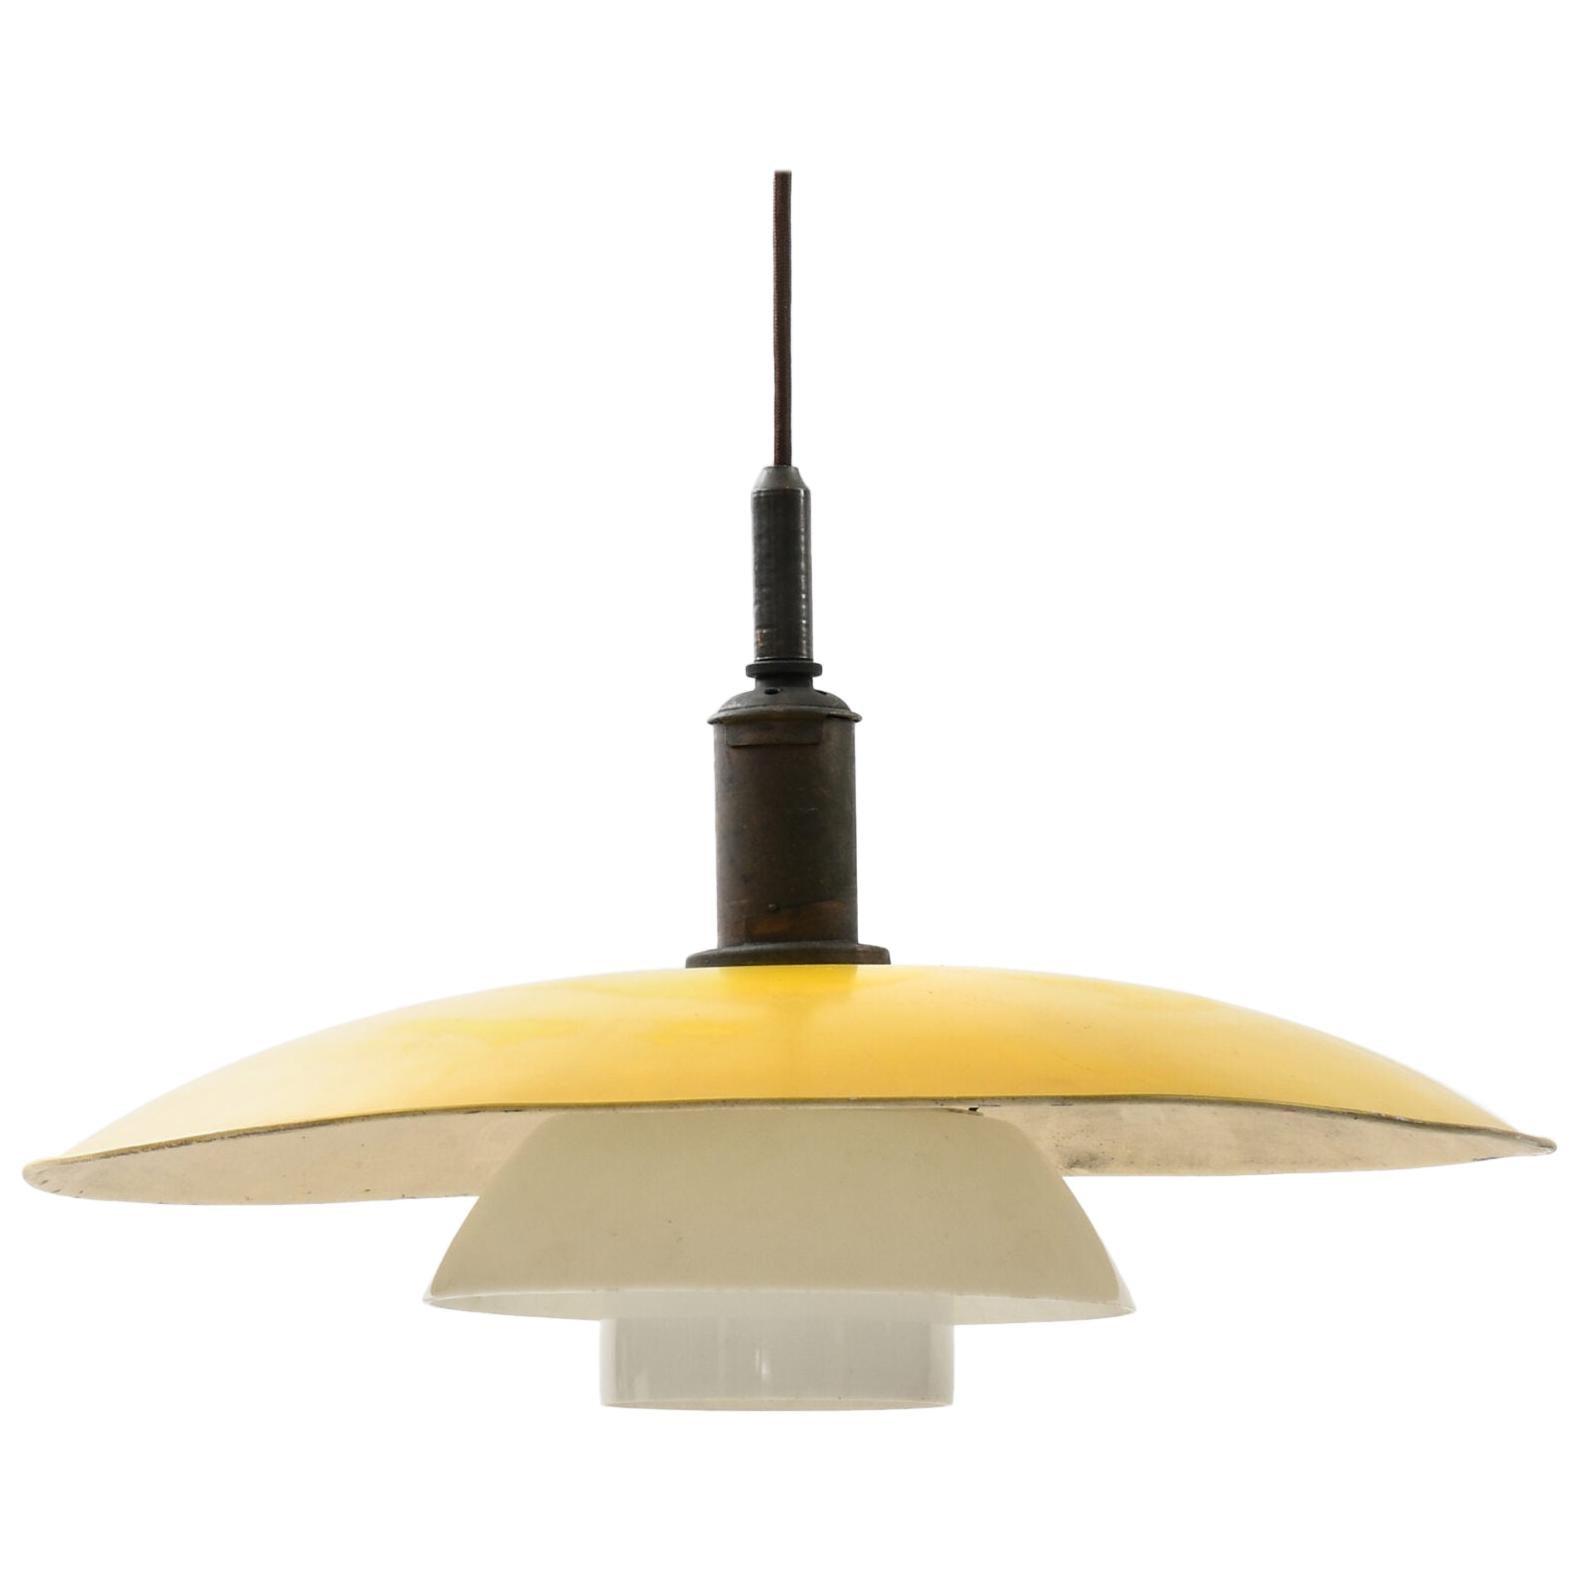 Poul Henningsen Ceiling Lamp PH-5/5 Produced by Louis Poulsen in Denmark